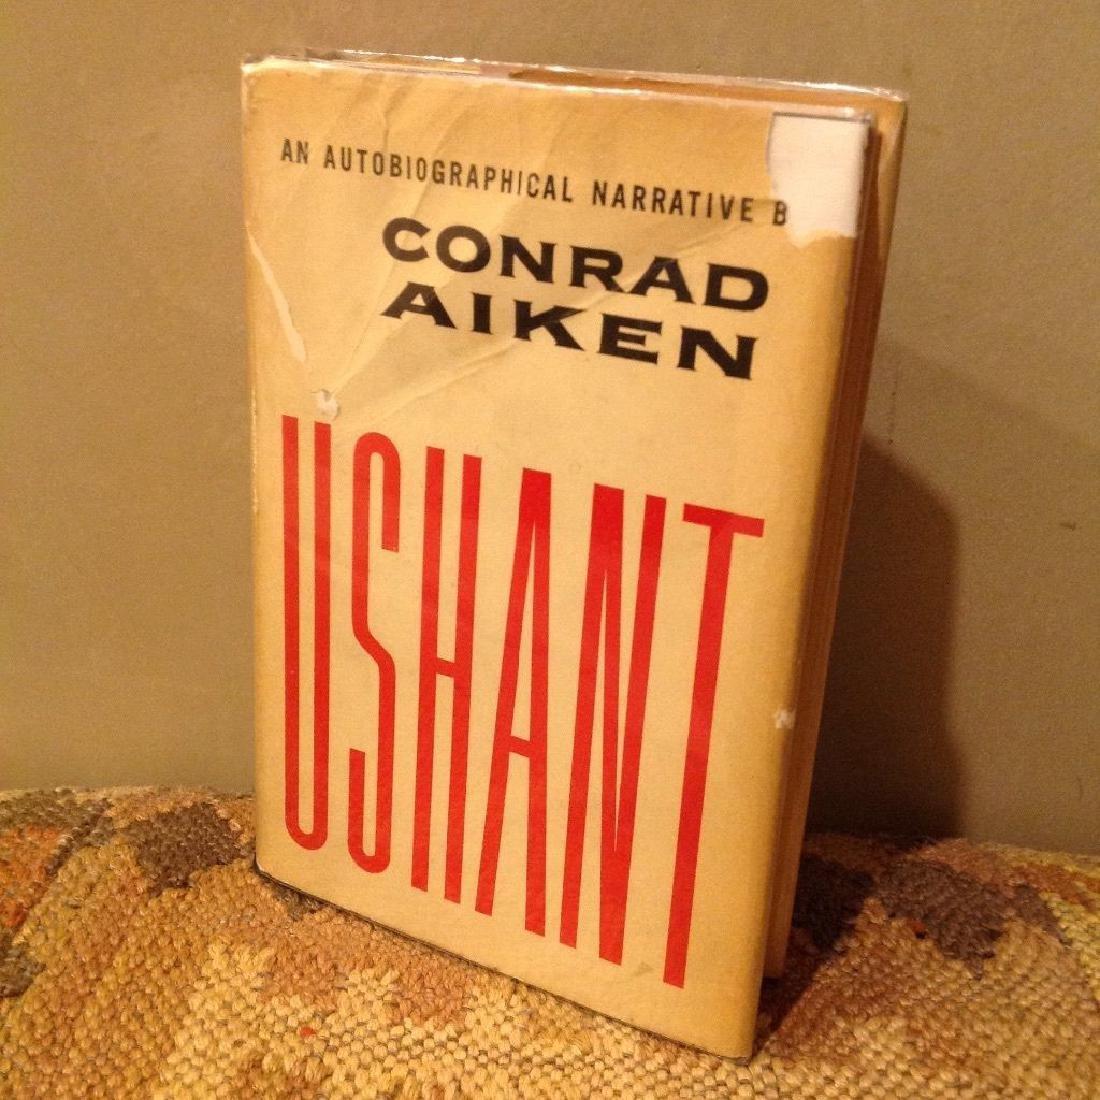 Conrad Aiken: Ushant, 1952 1st Ed